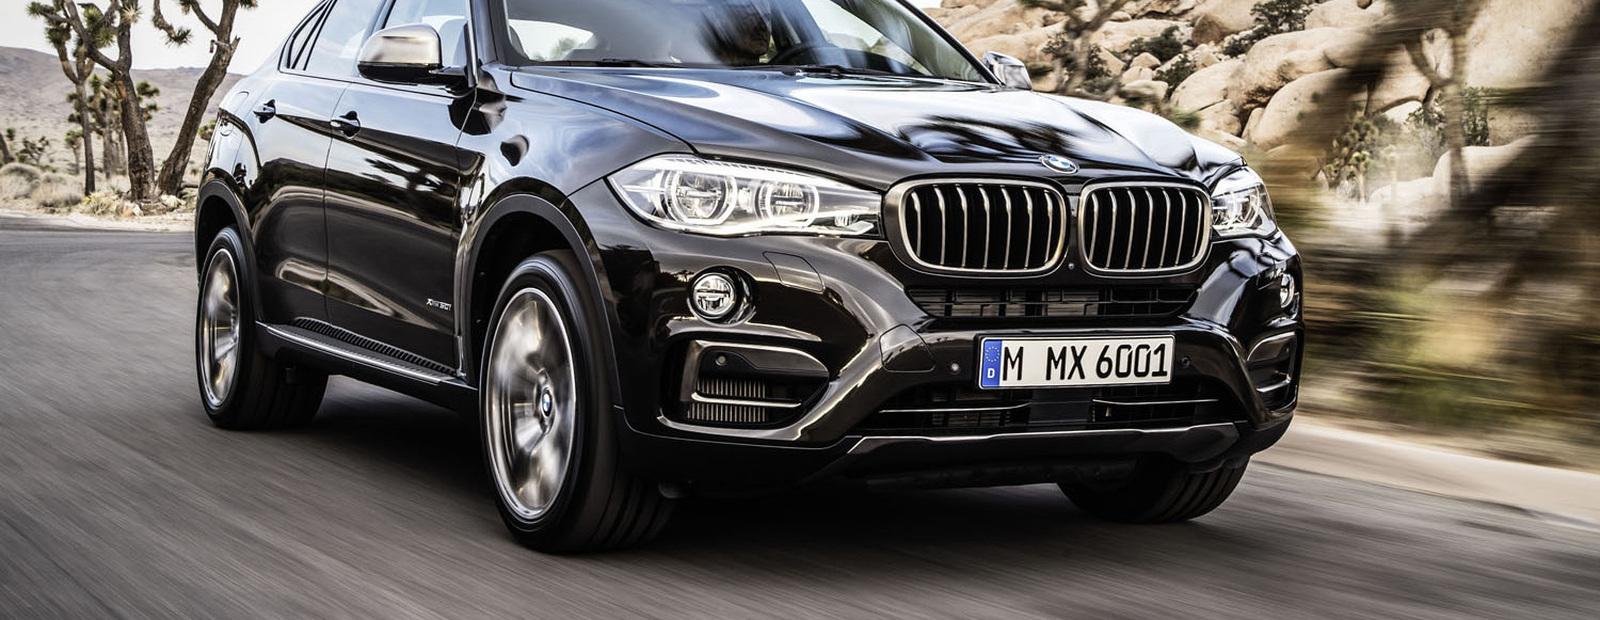 Посчитали-прослезились: замена раздаточной коробки BMW X6